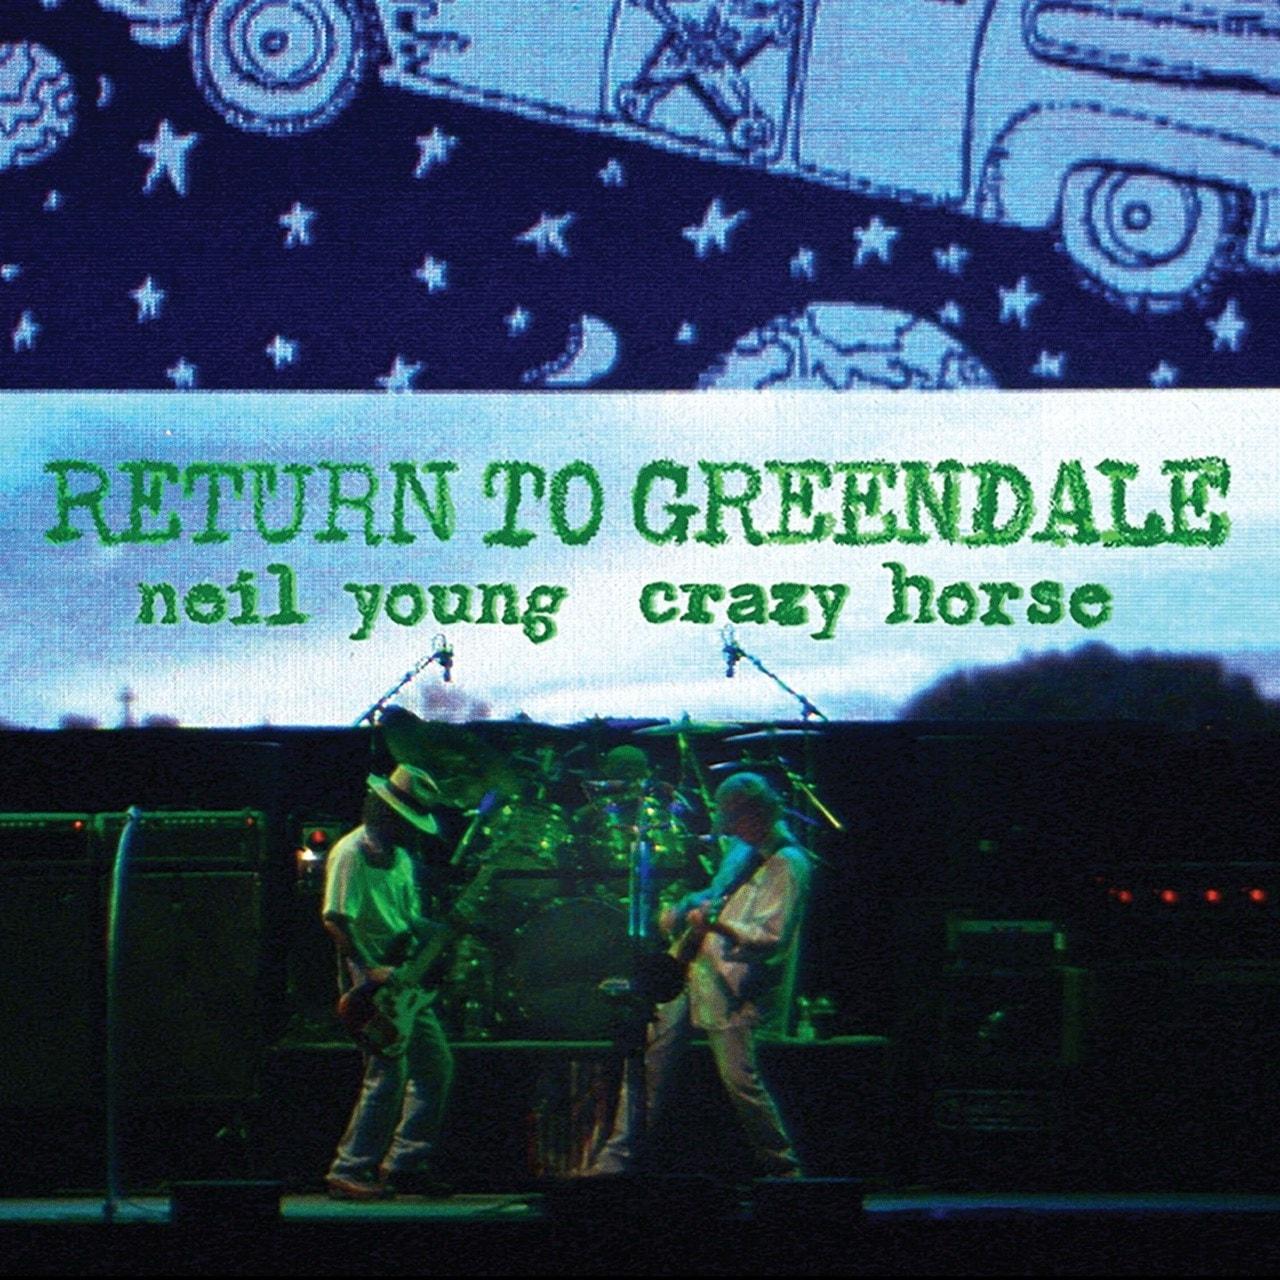 Return to Greendale - 1